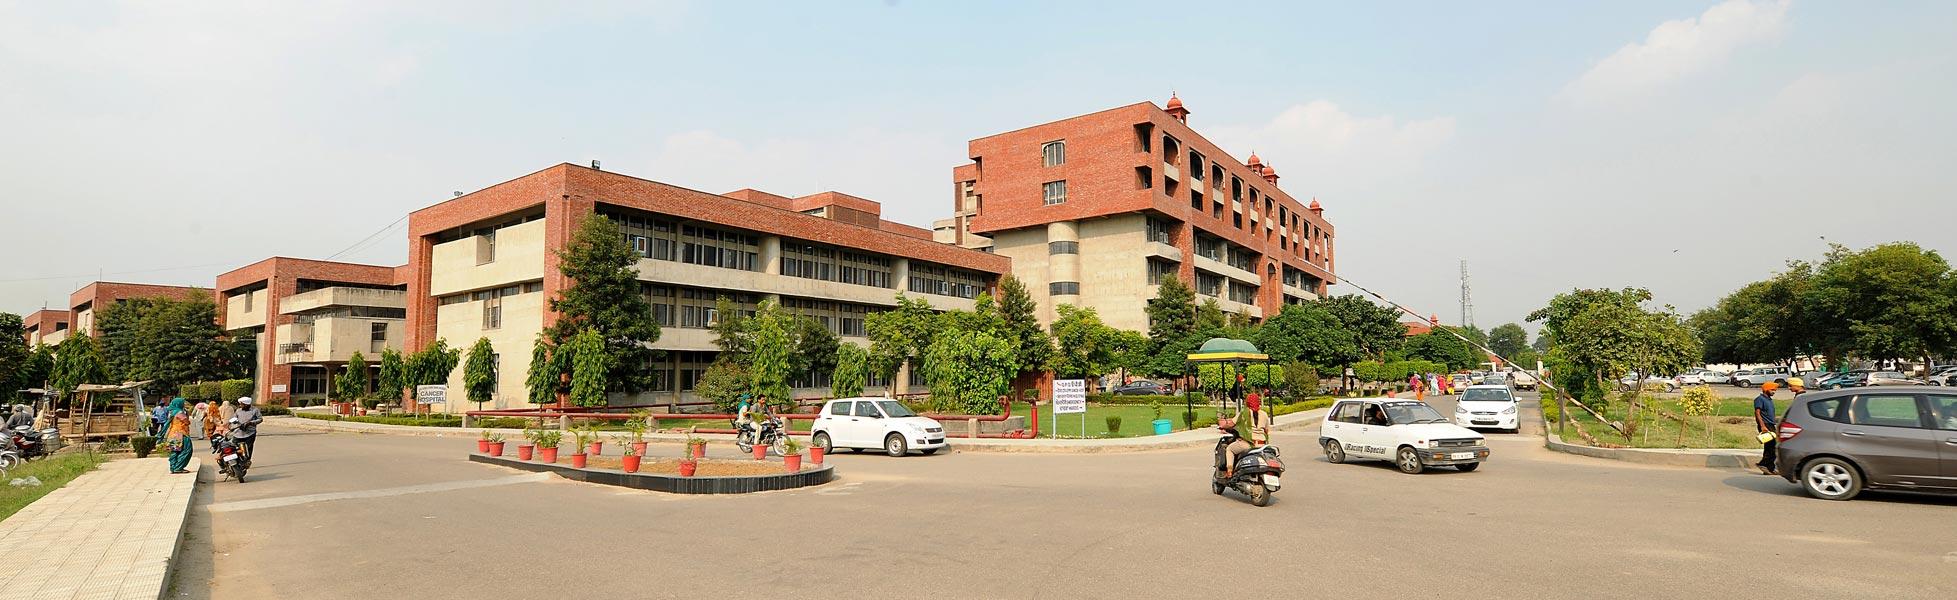 Sri Guru Ram Das Institute of Medical Sciences and Research, Amritsar Image